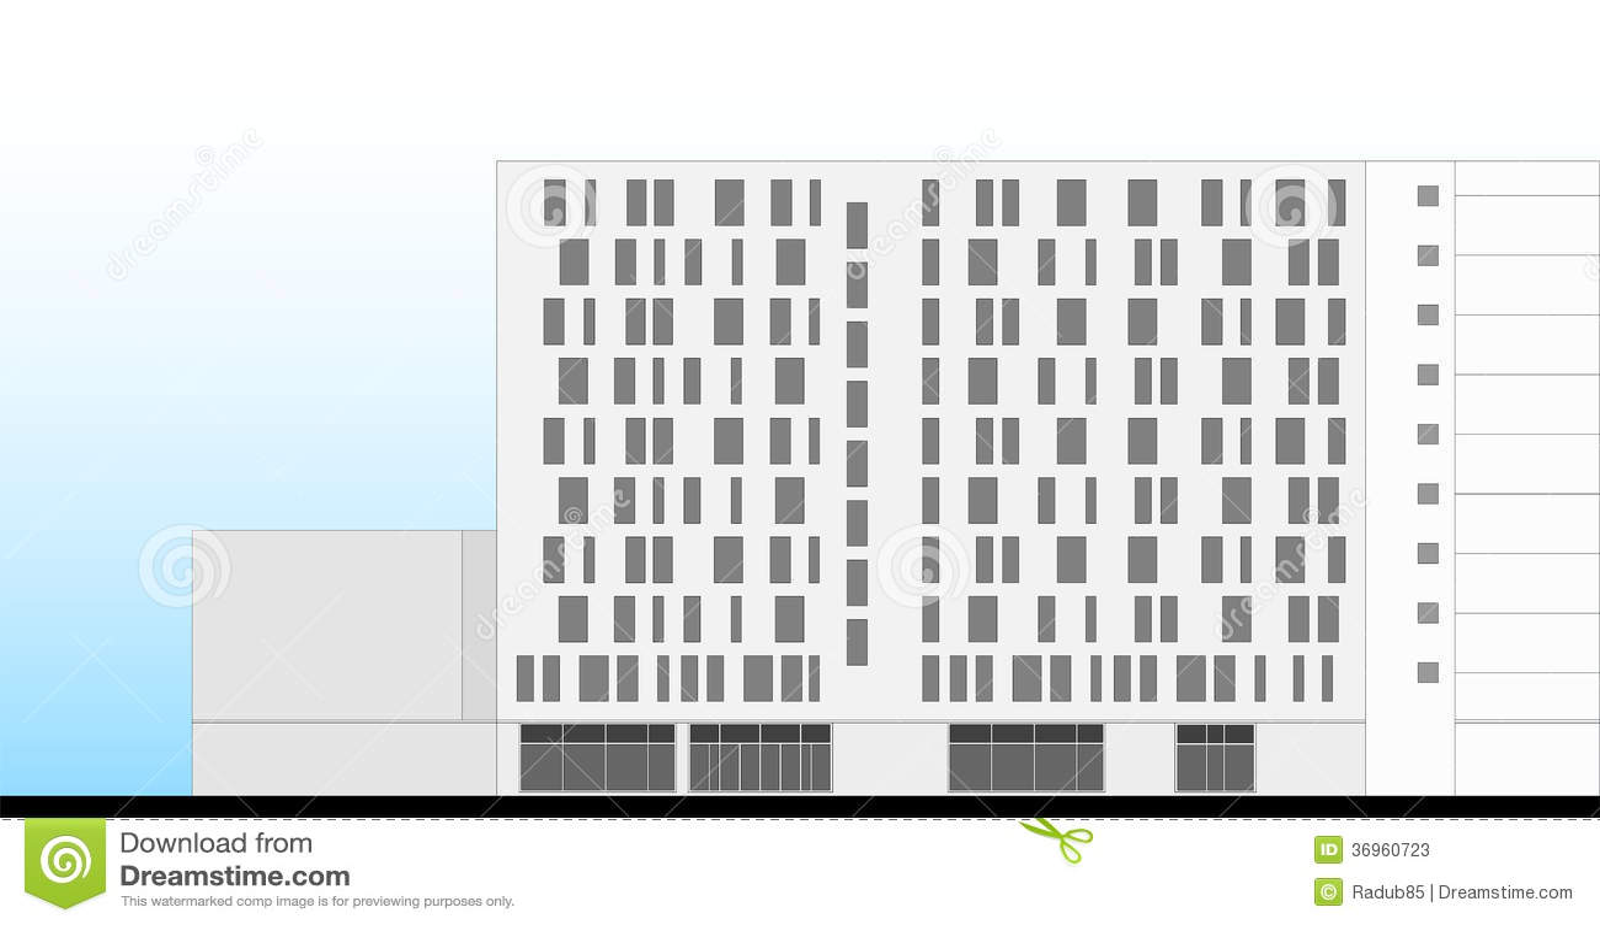 plan architectural de fa ade de b timent d 39 h tel photos stock image 36960723. Black Bedroom Furniture Sets. Home Design Ideas